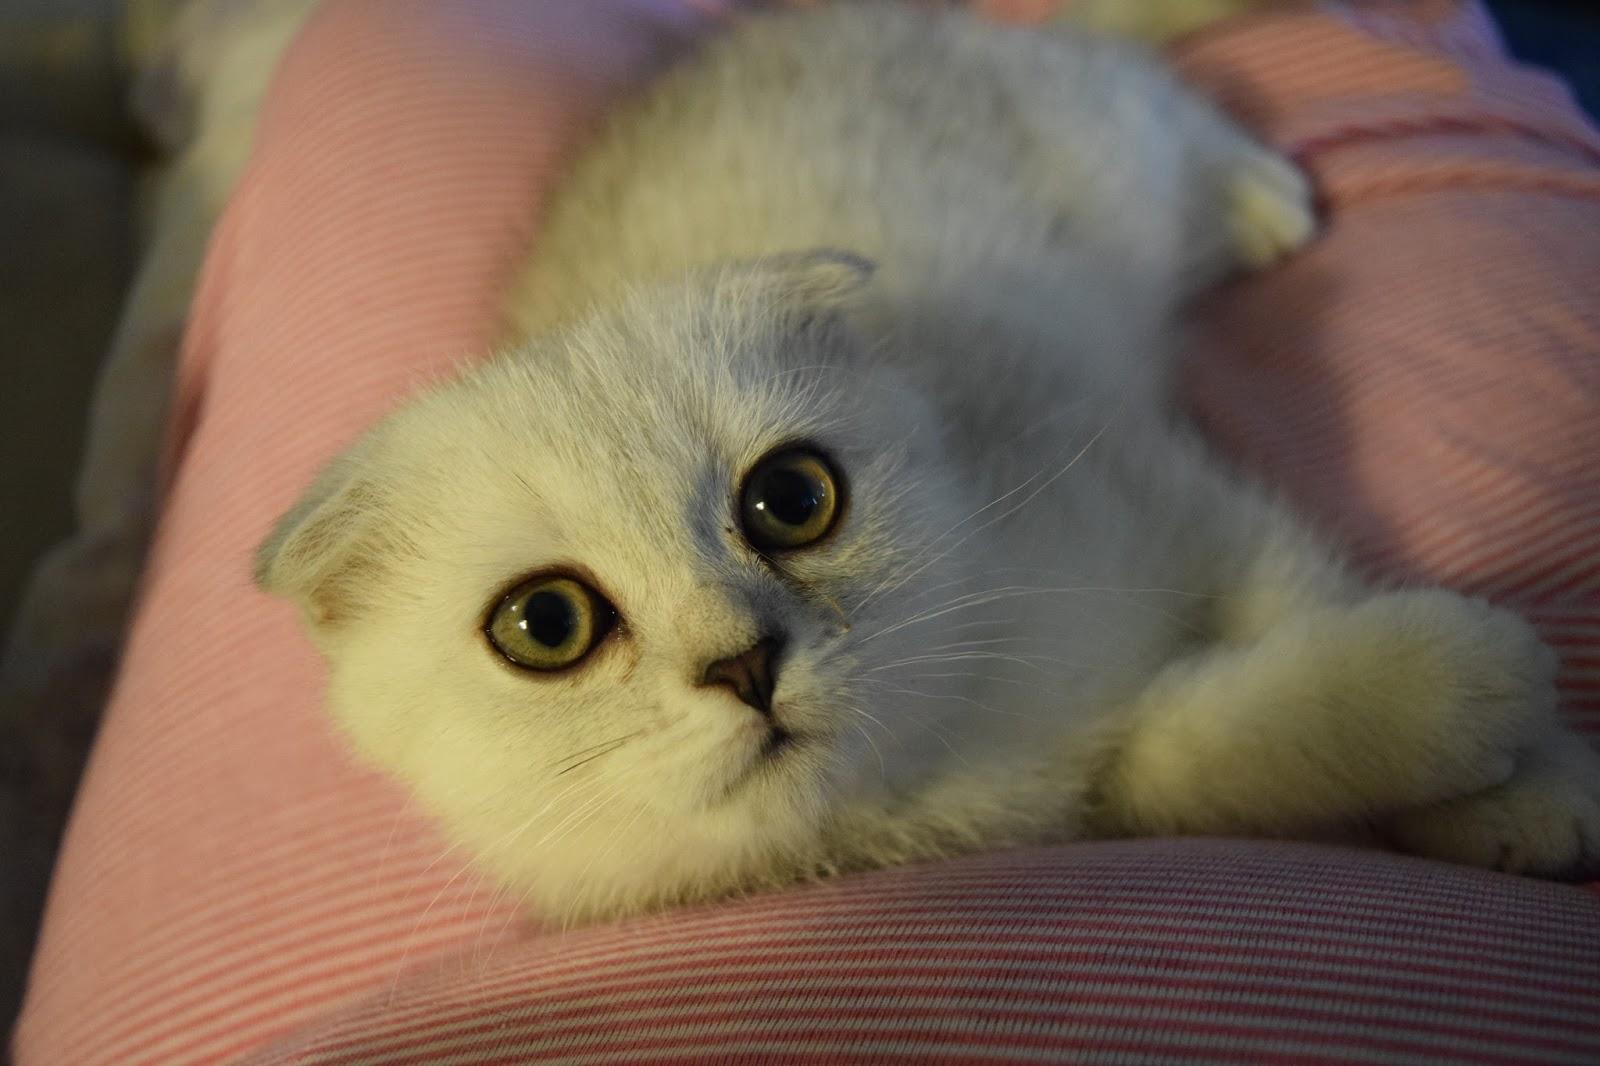 kittens at 6 weeks